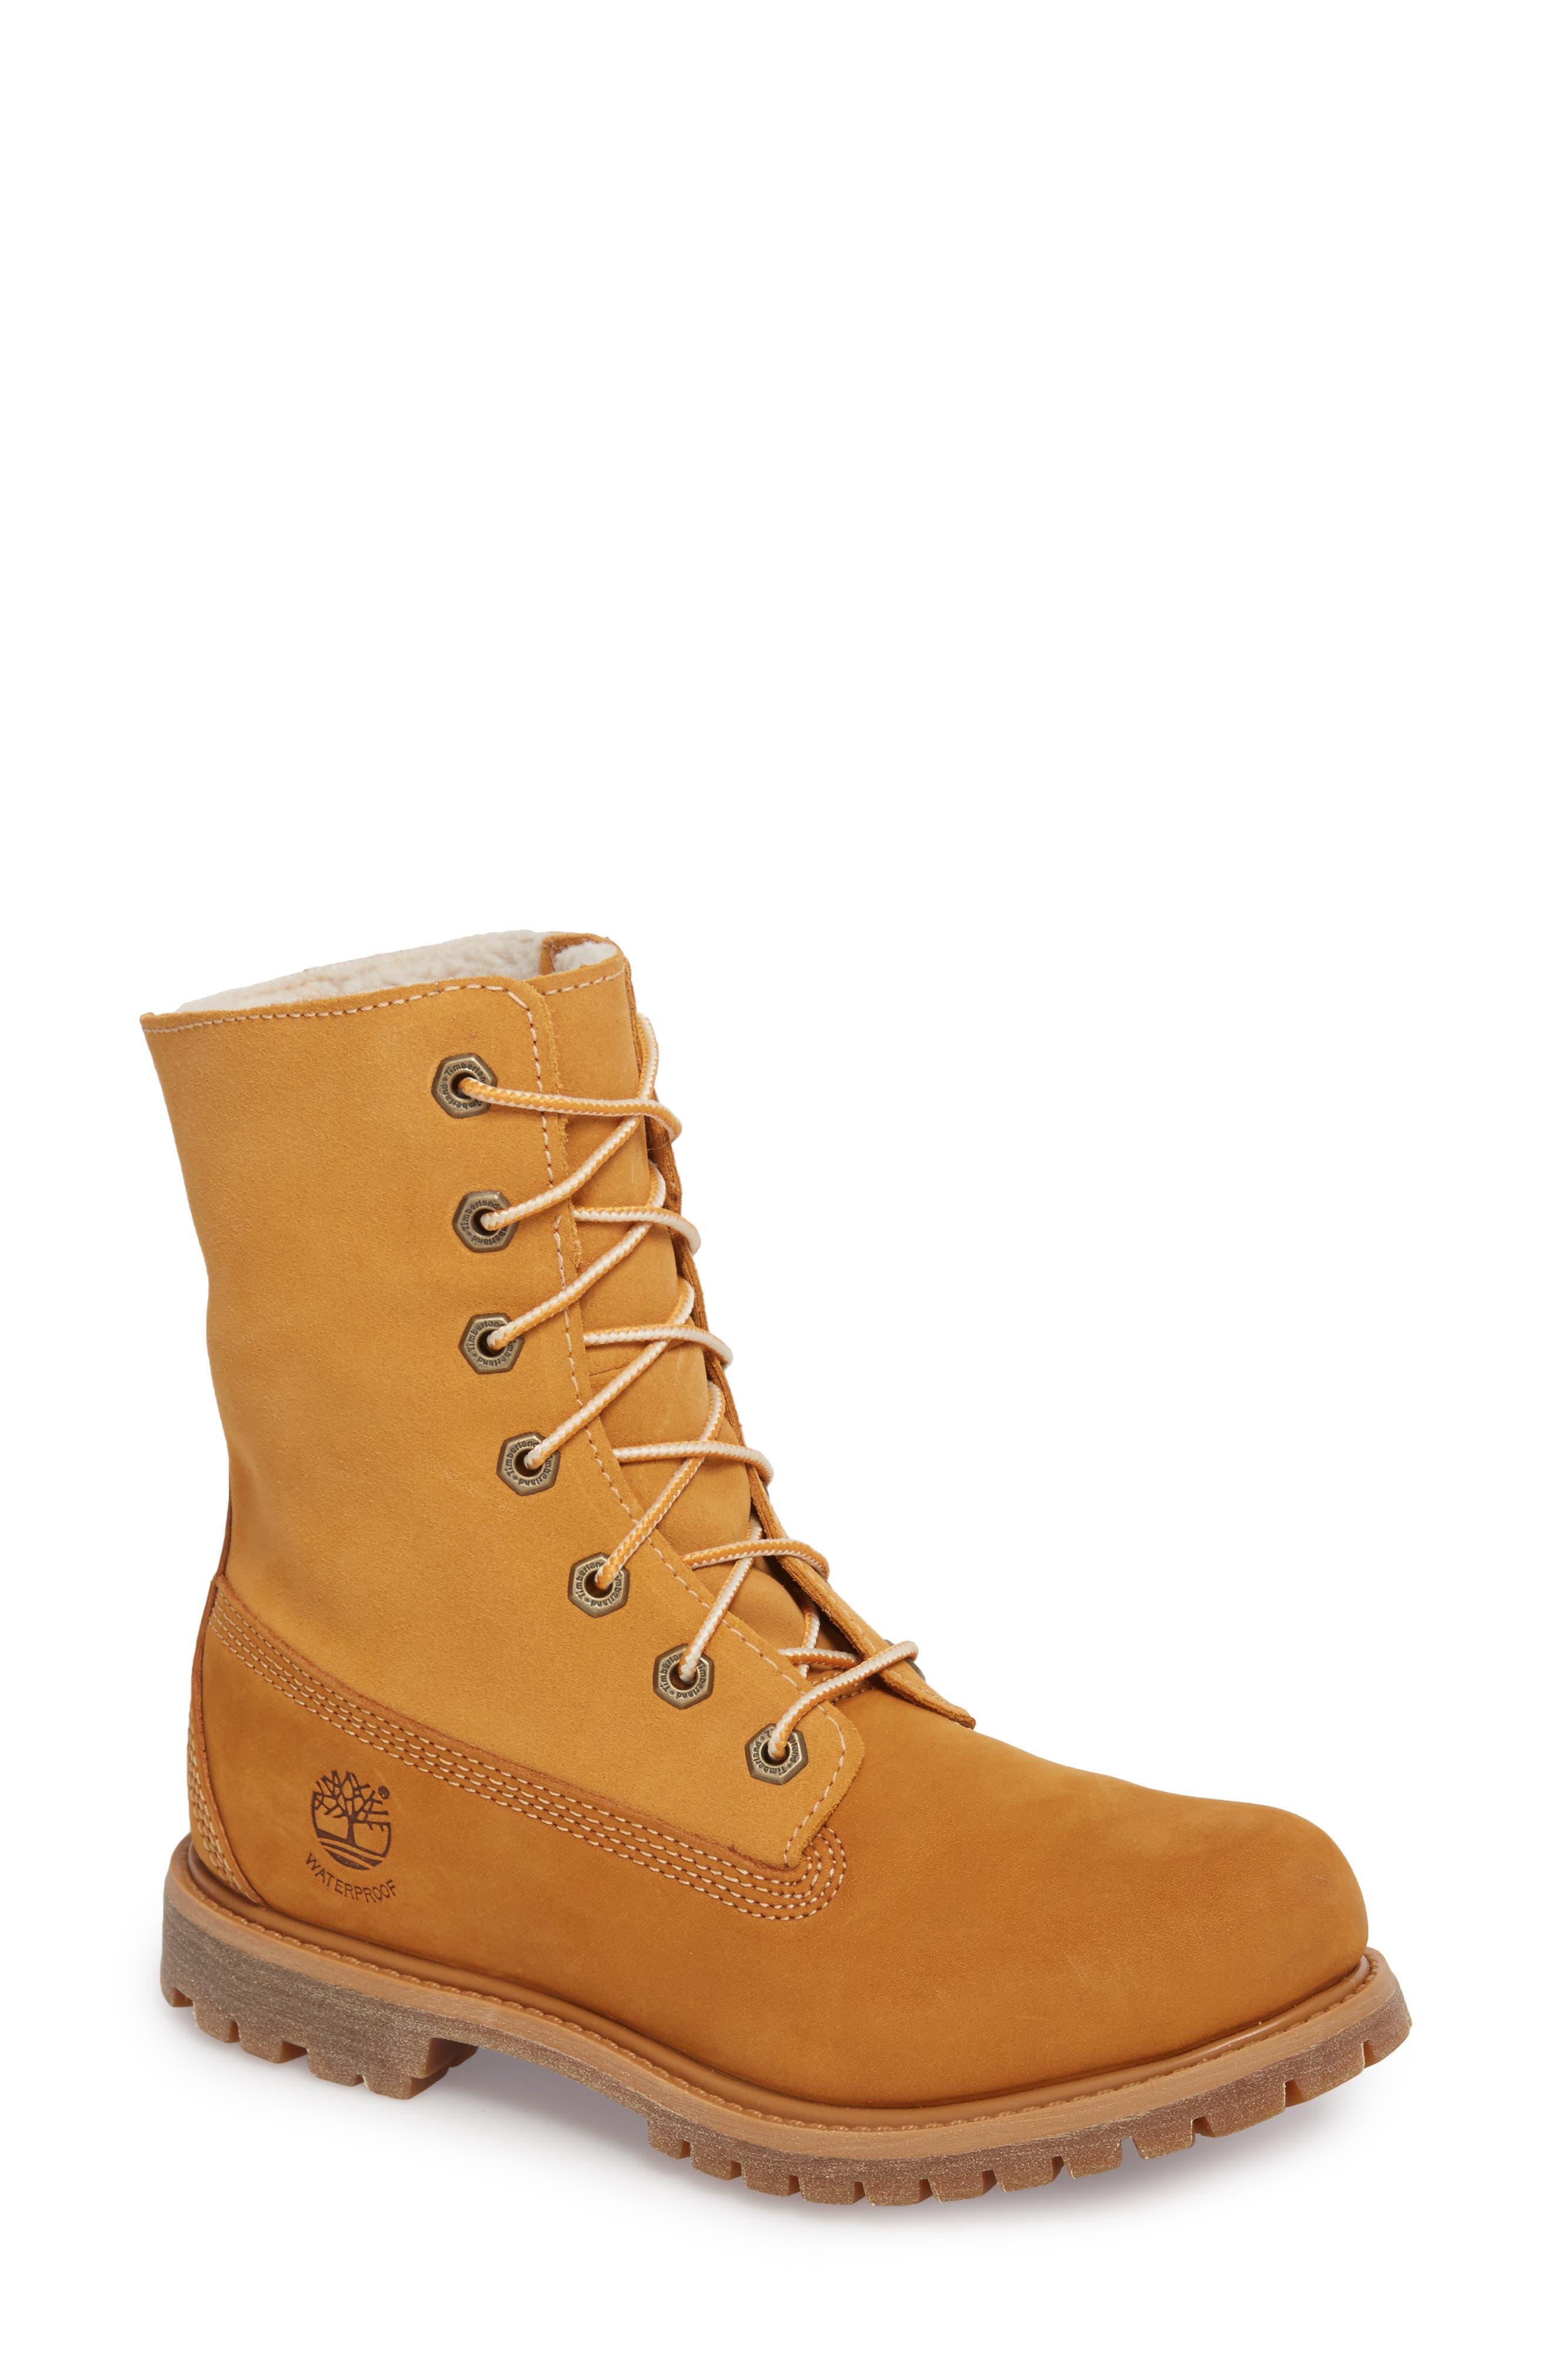 Timberland Authentic Waterproof Teddy Fleece Lined Winter Boot (Women)